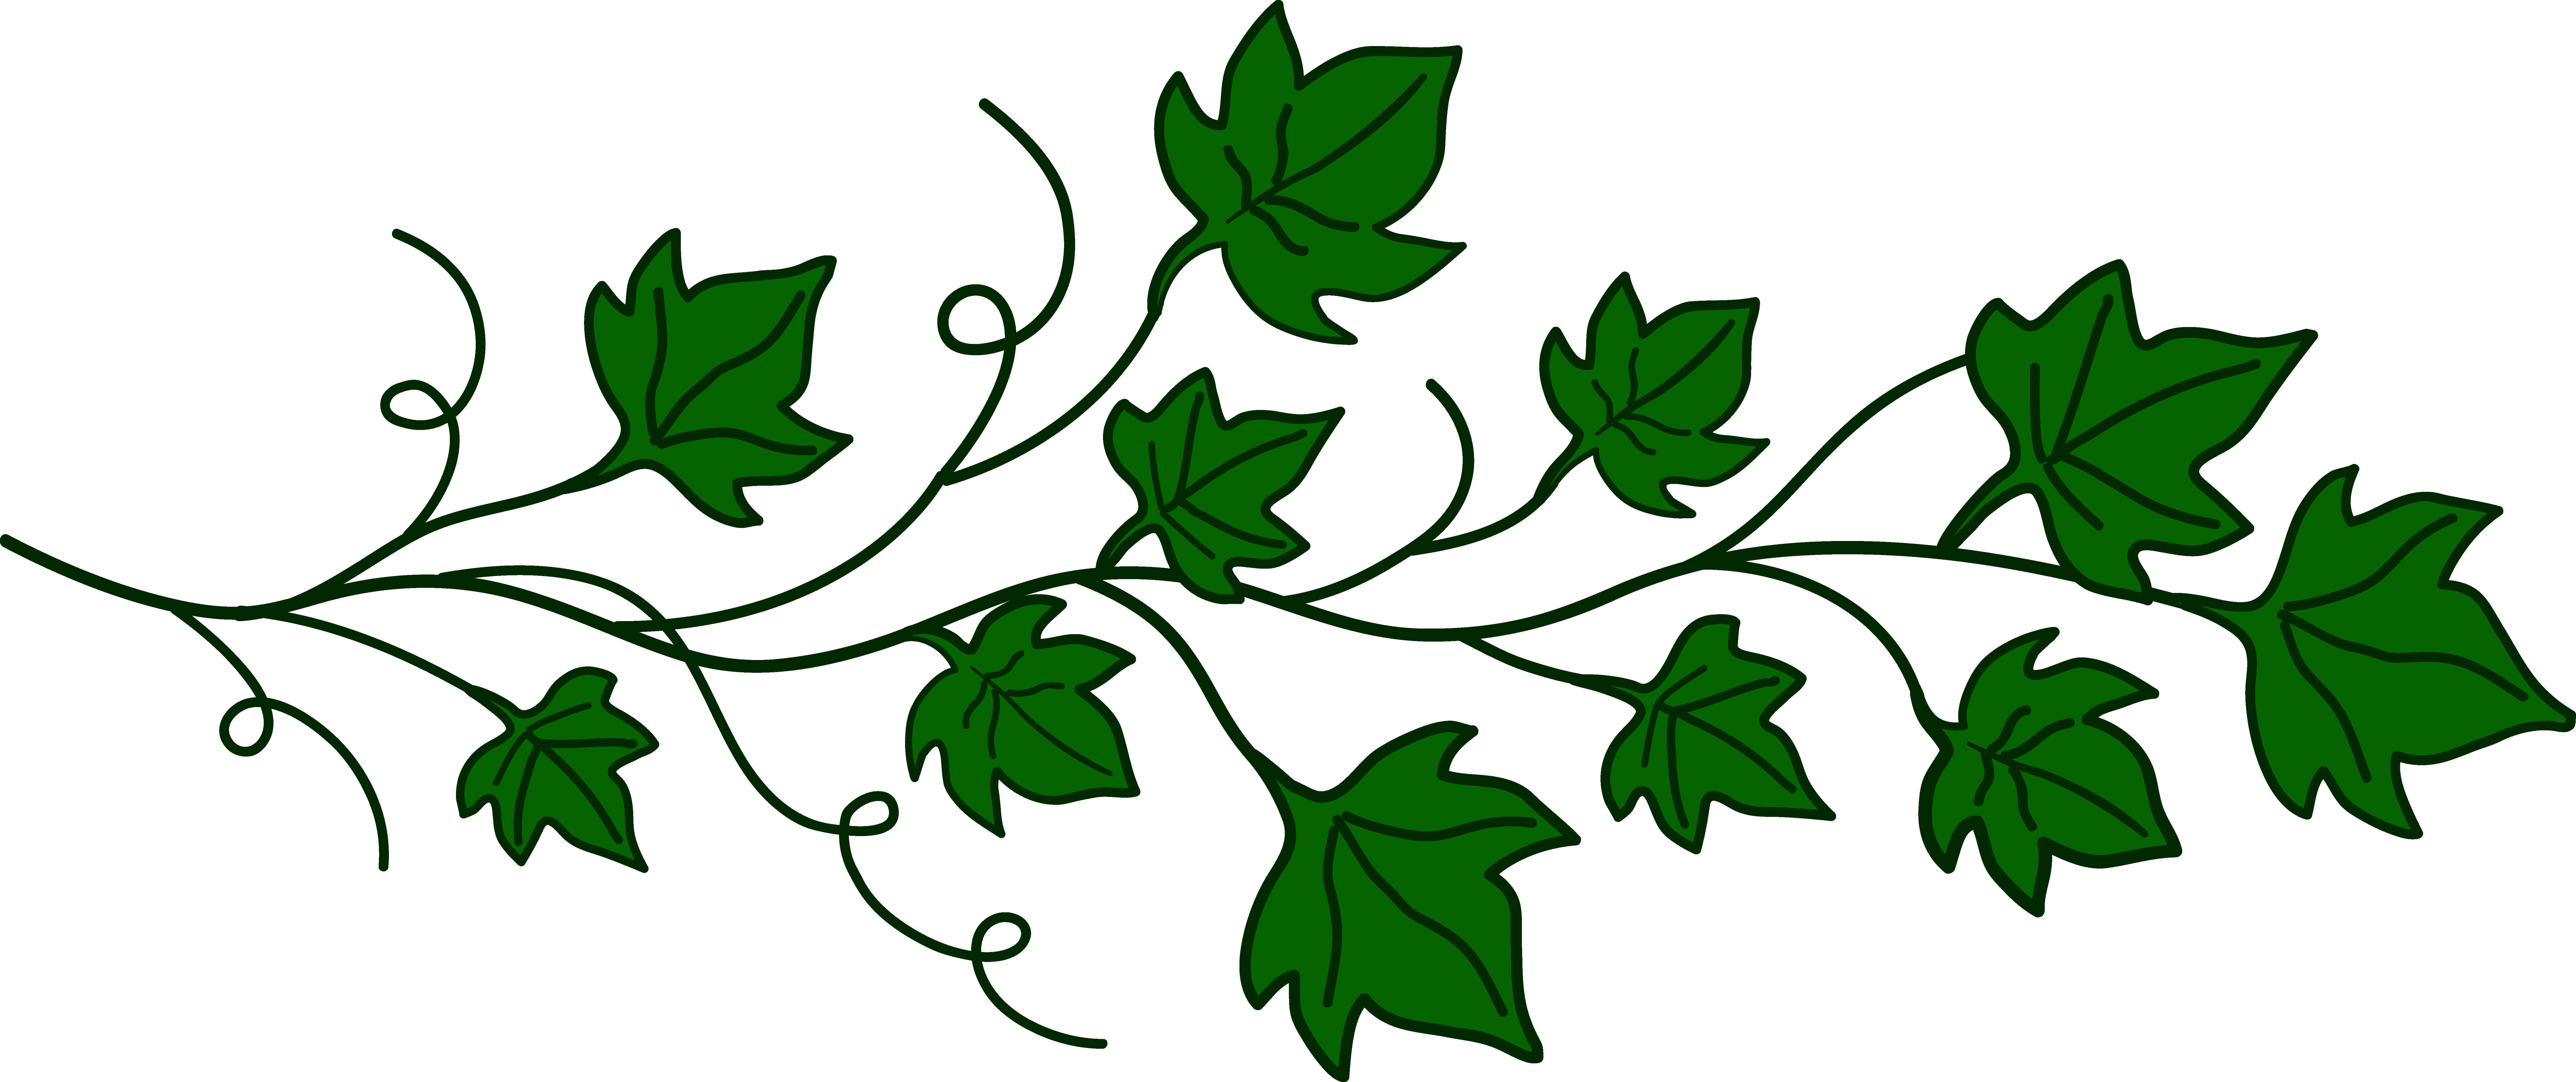 Vine of ivy leaves free clip art-Vine of ivy leaves free clip art-3